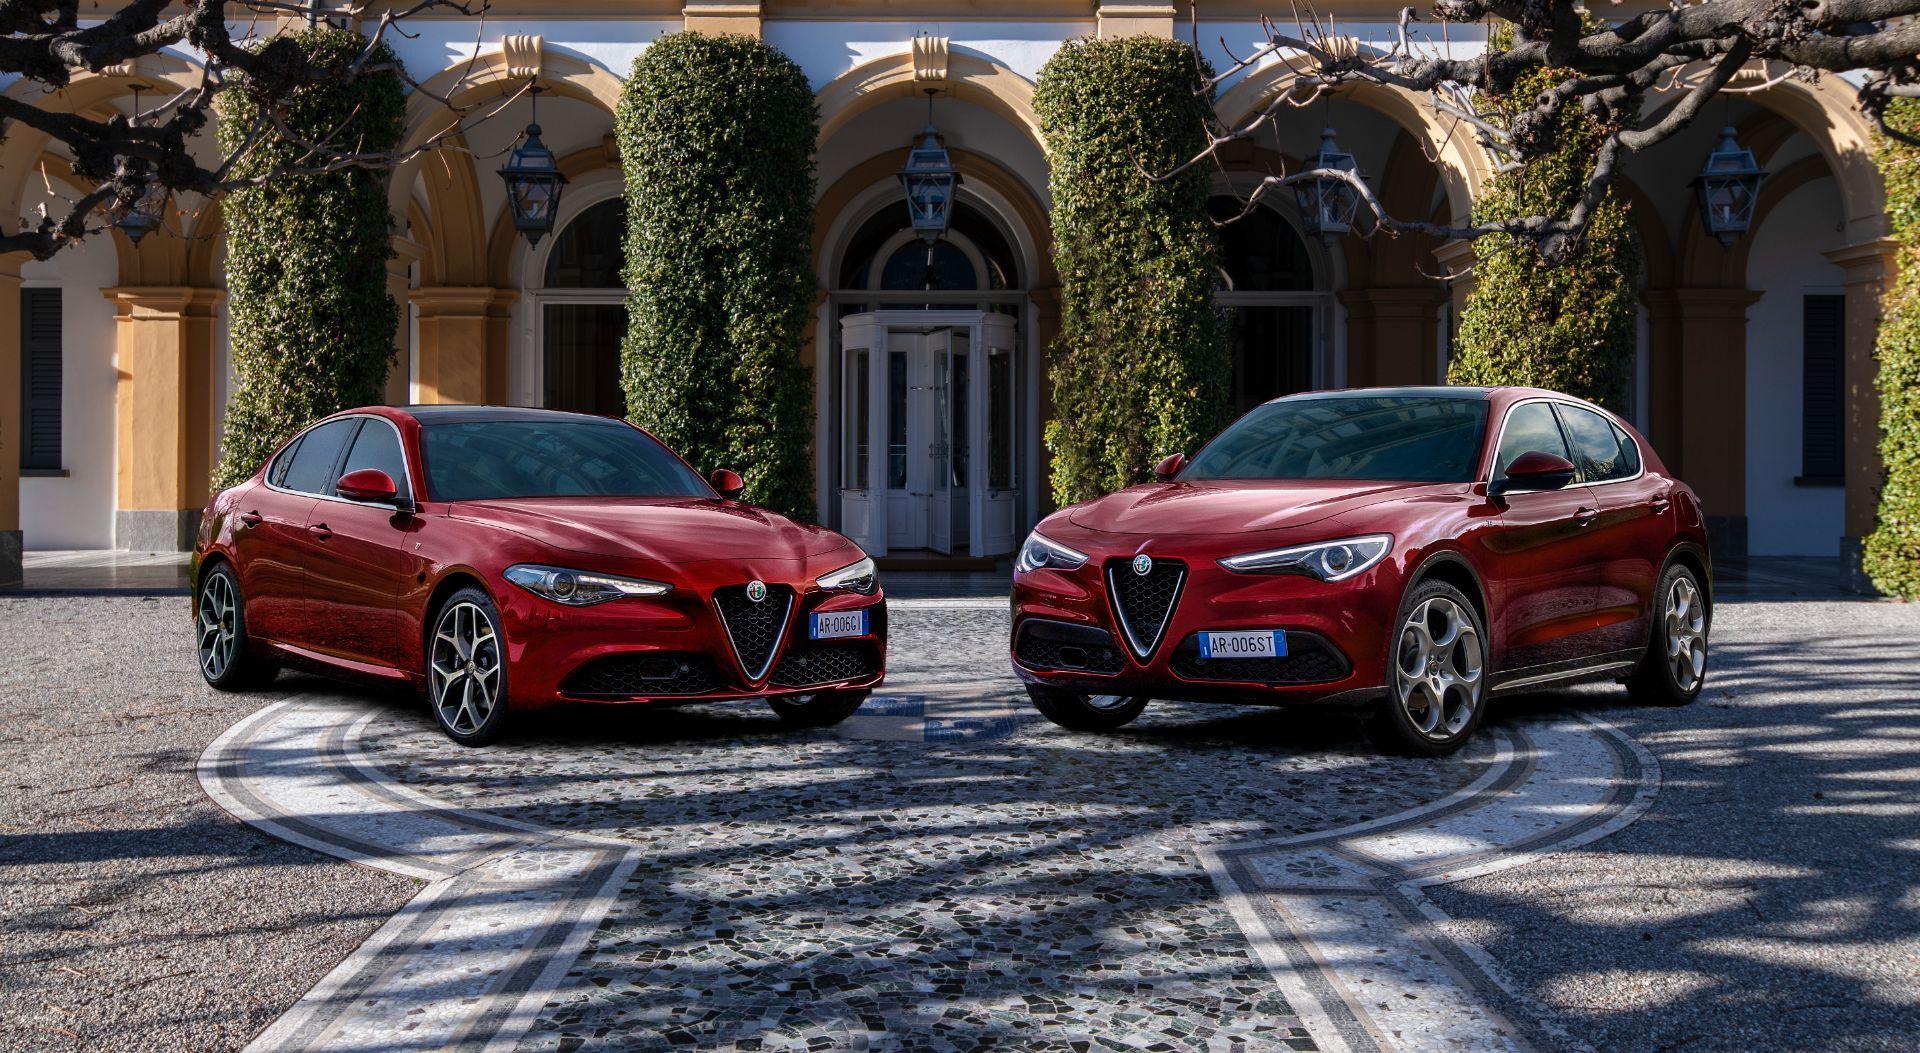 Alfa-Romeo-Giulia-and-Stelvio-6C-Villa-dEste-1